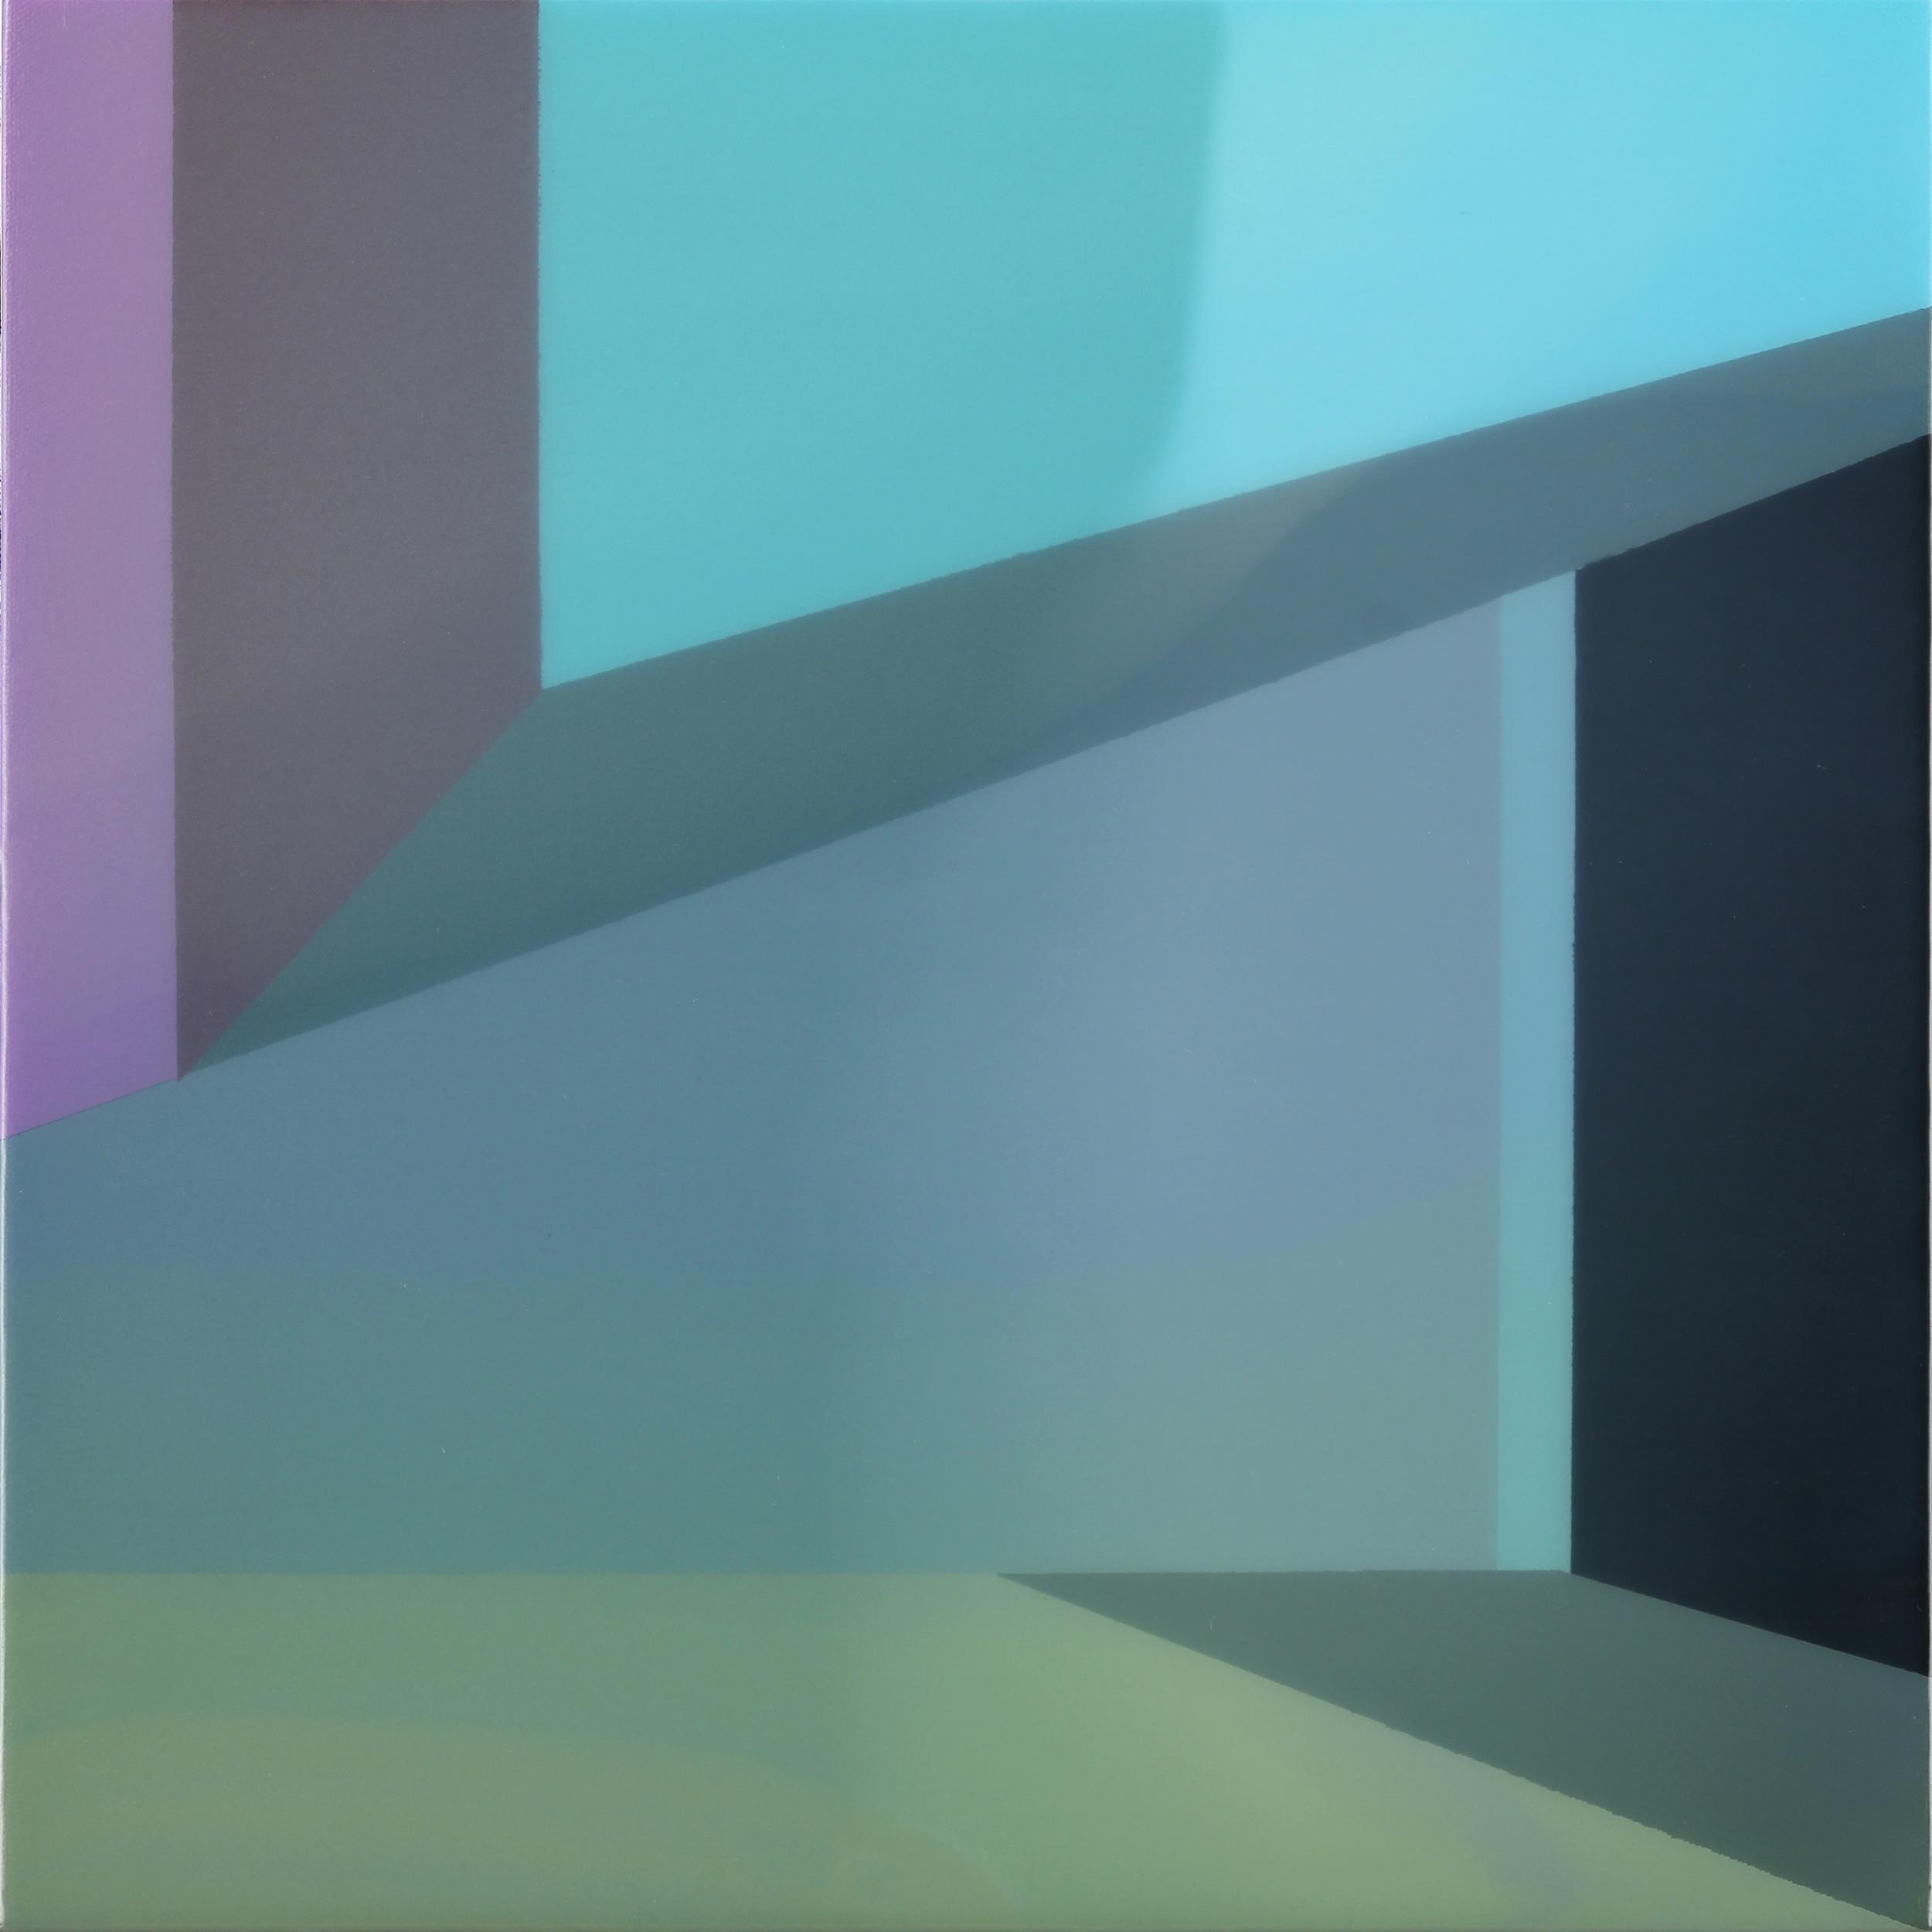 """Level 5"", Acrylic on canvas over panel, 16"" X 16"", 2015."